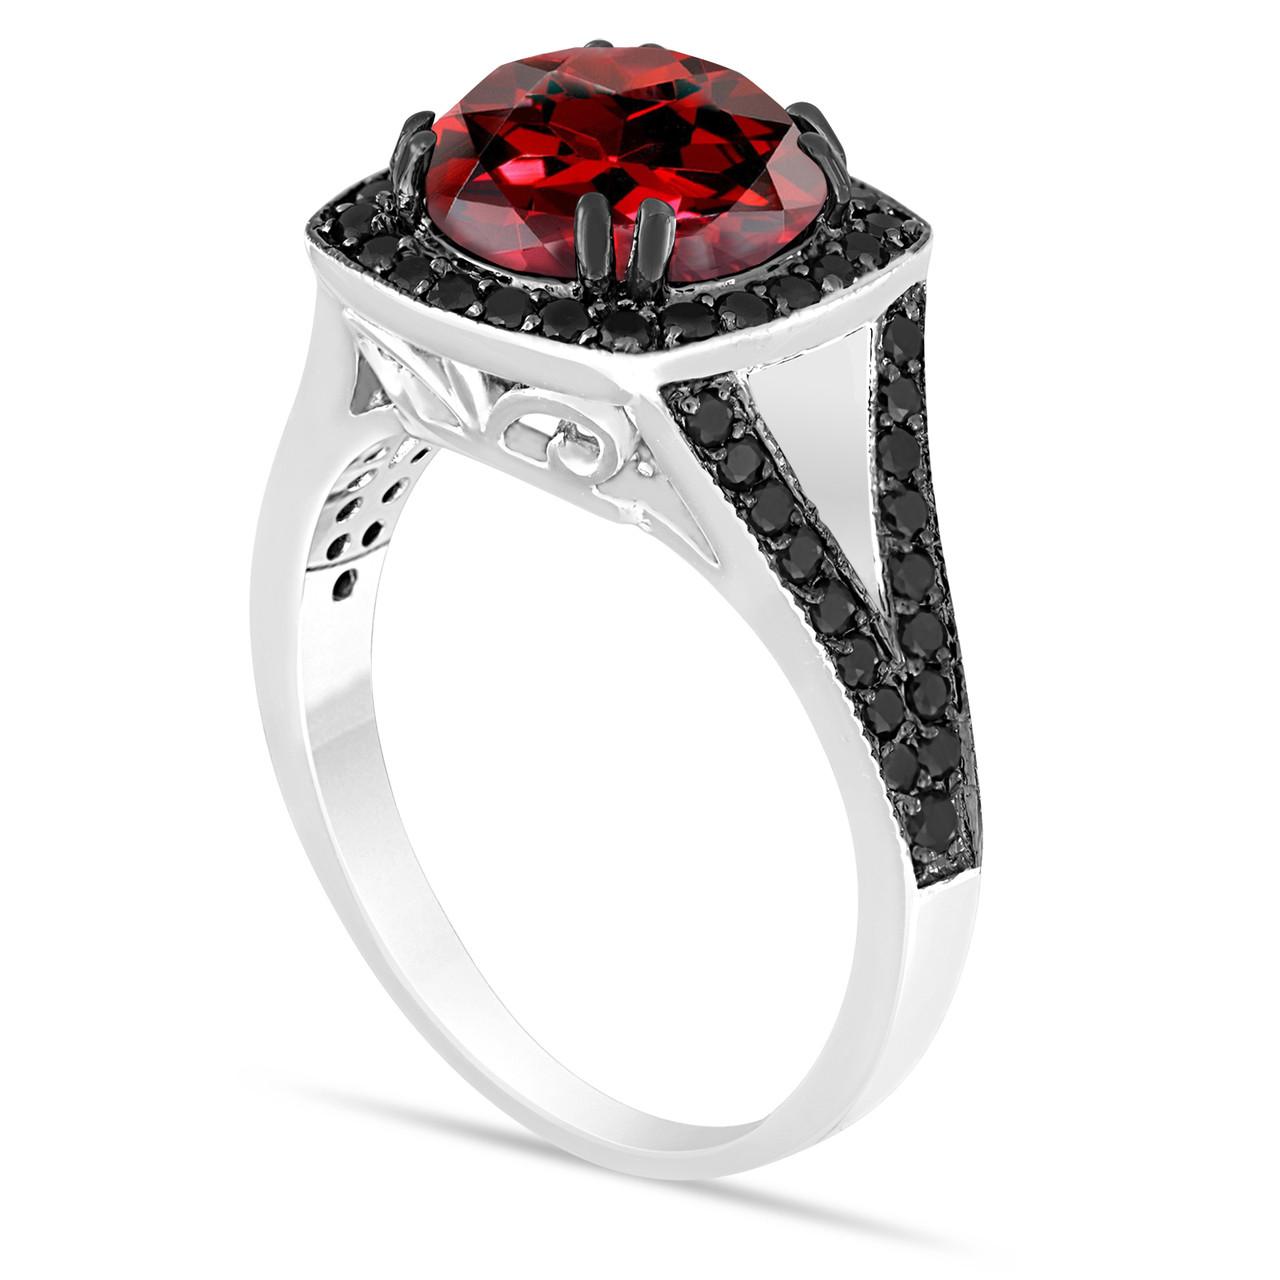 Fine Jewelry Black Diamond Engagement Ring 3.34 Ct Diamond Silver Ring New Handmade !! Diamond